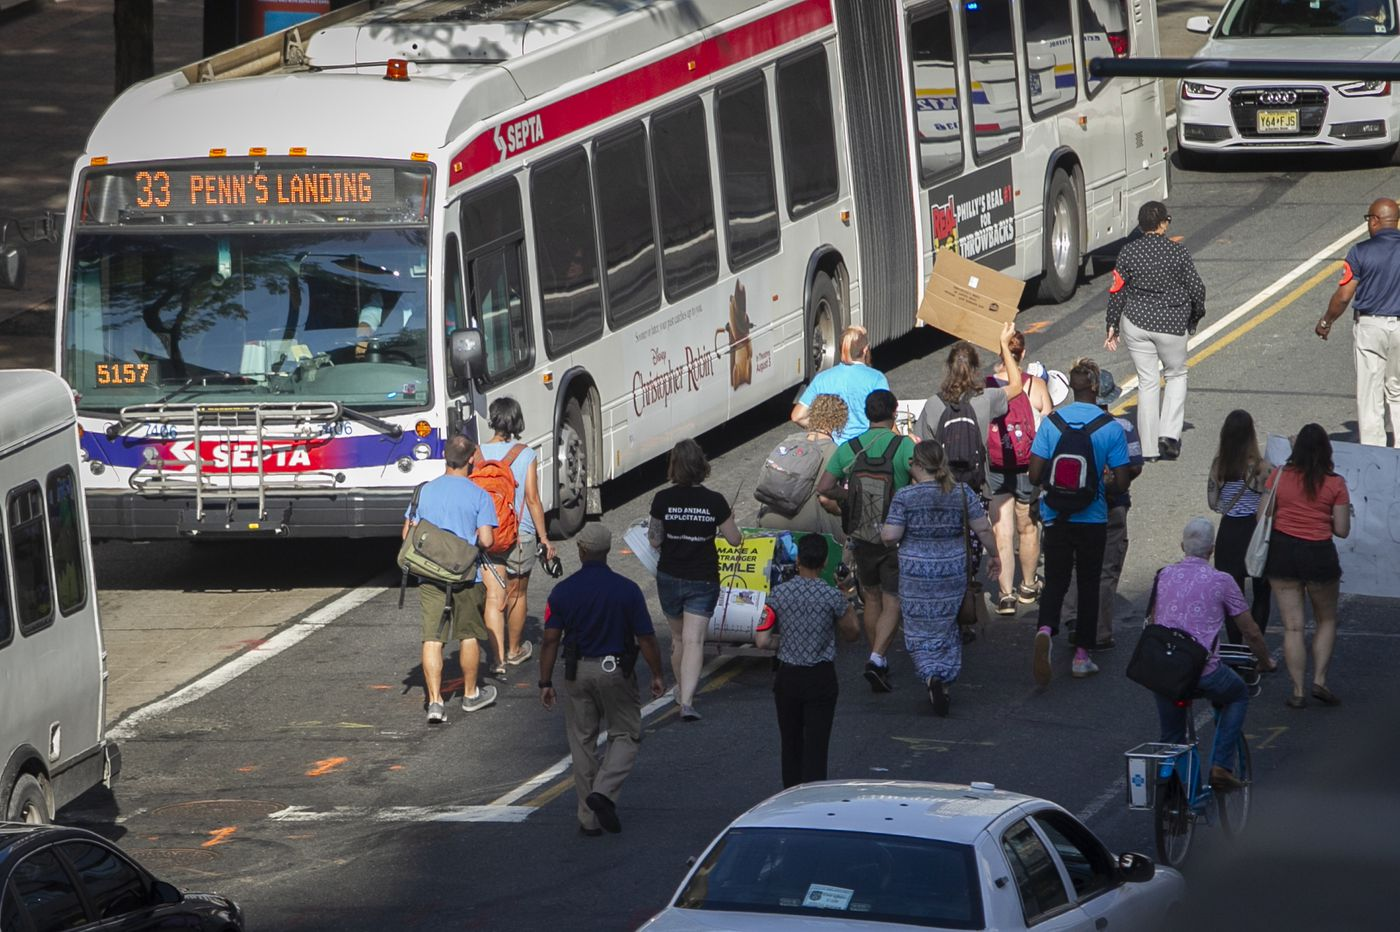 Anti-ICE protesters block traffic in Center City Philadelphia